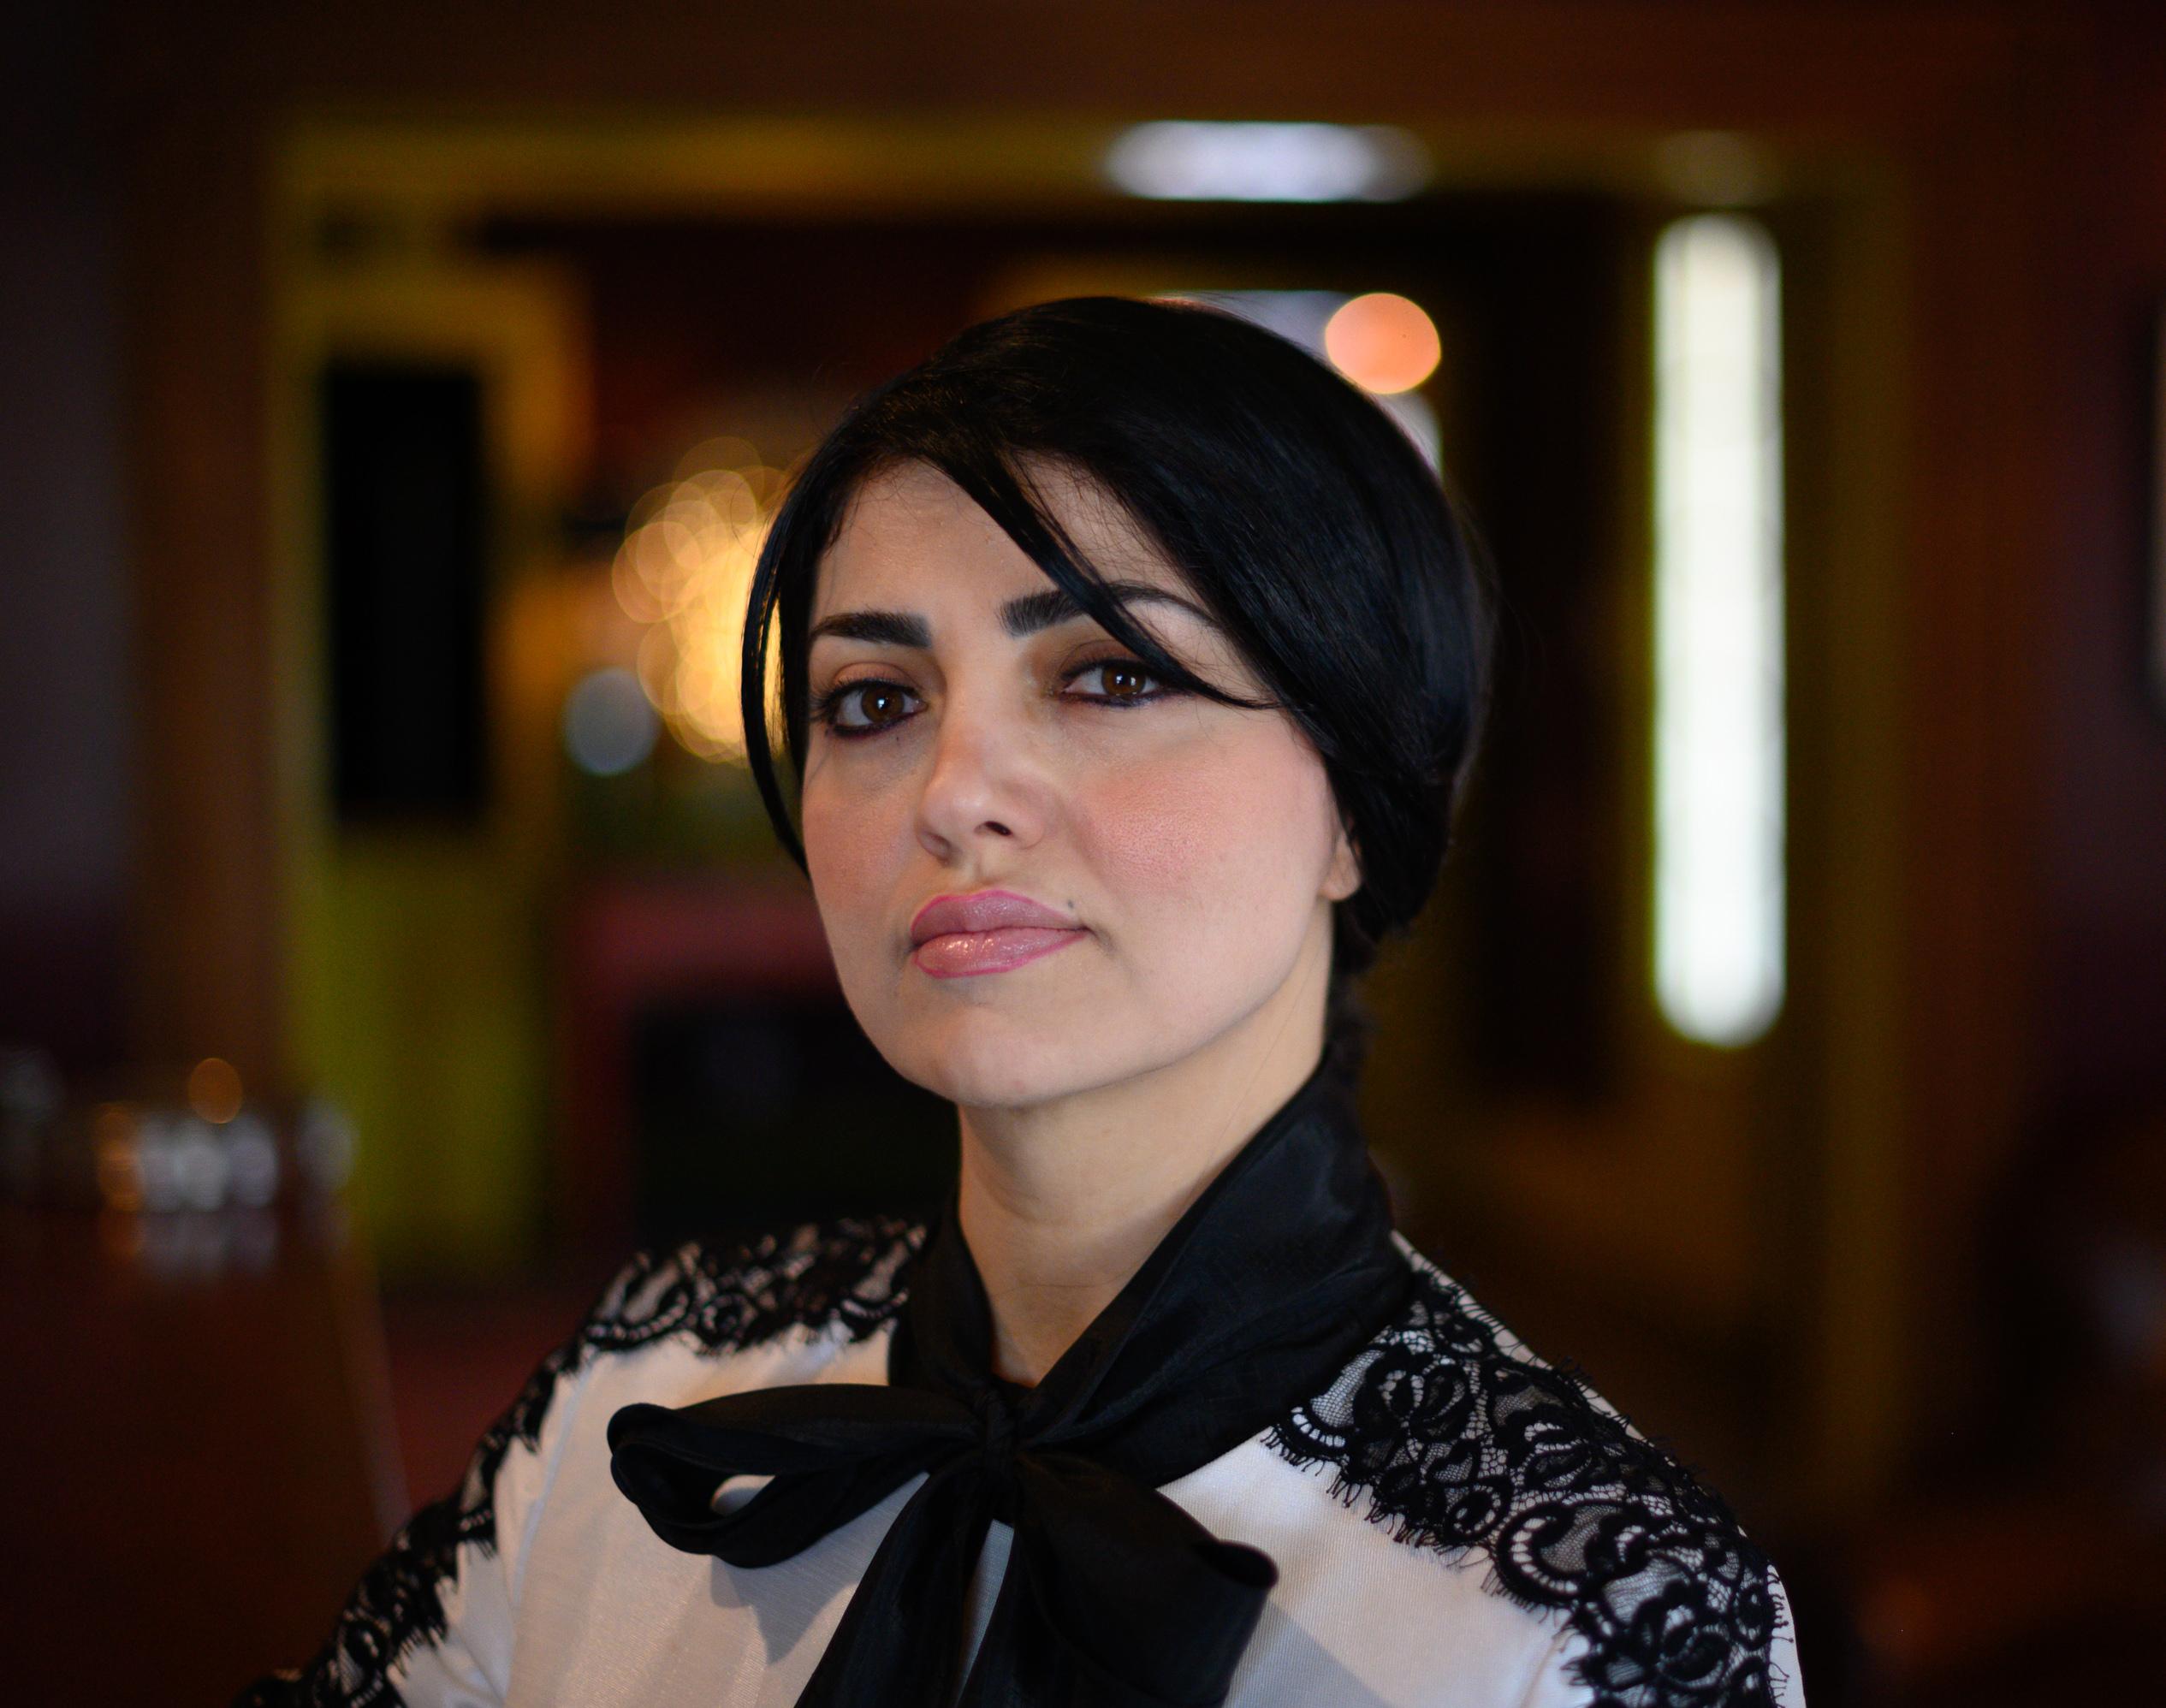 MAGA Star Rabia Kazan, A Former Muslim, Now Turning Against Trump World